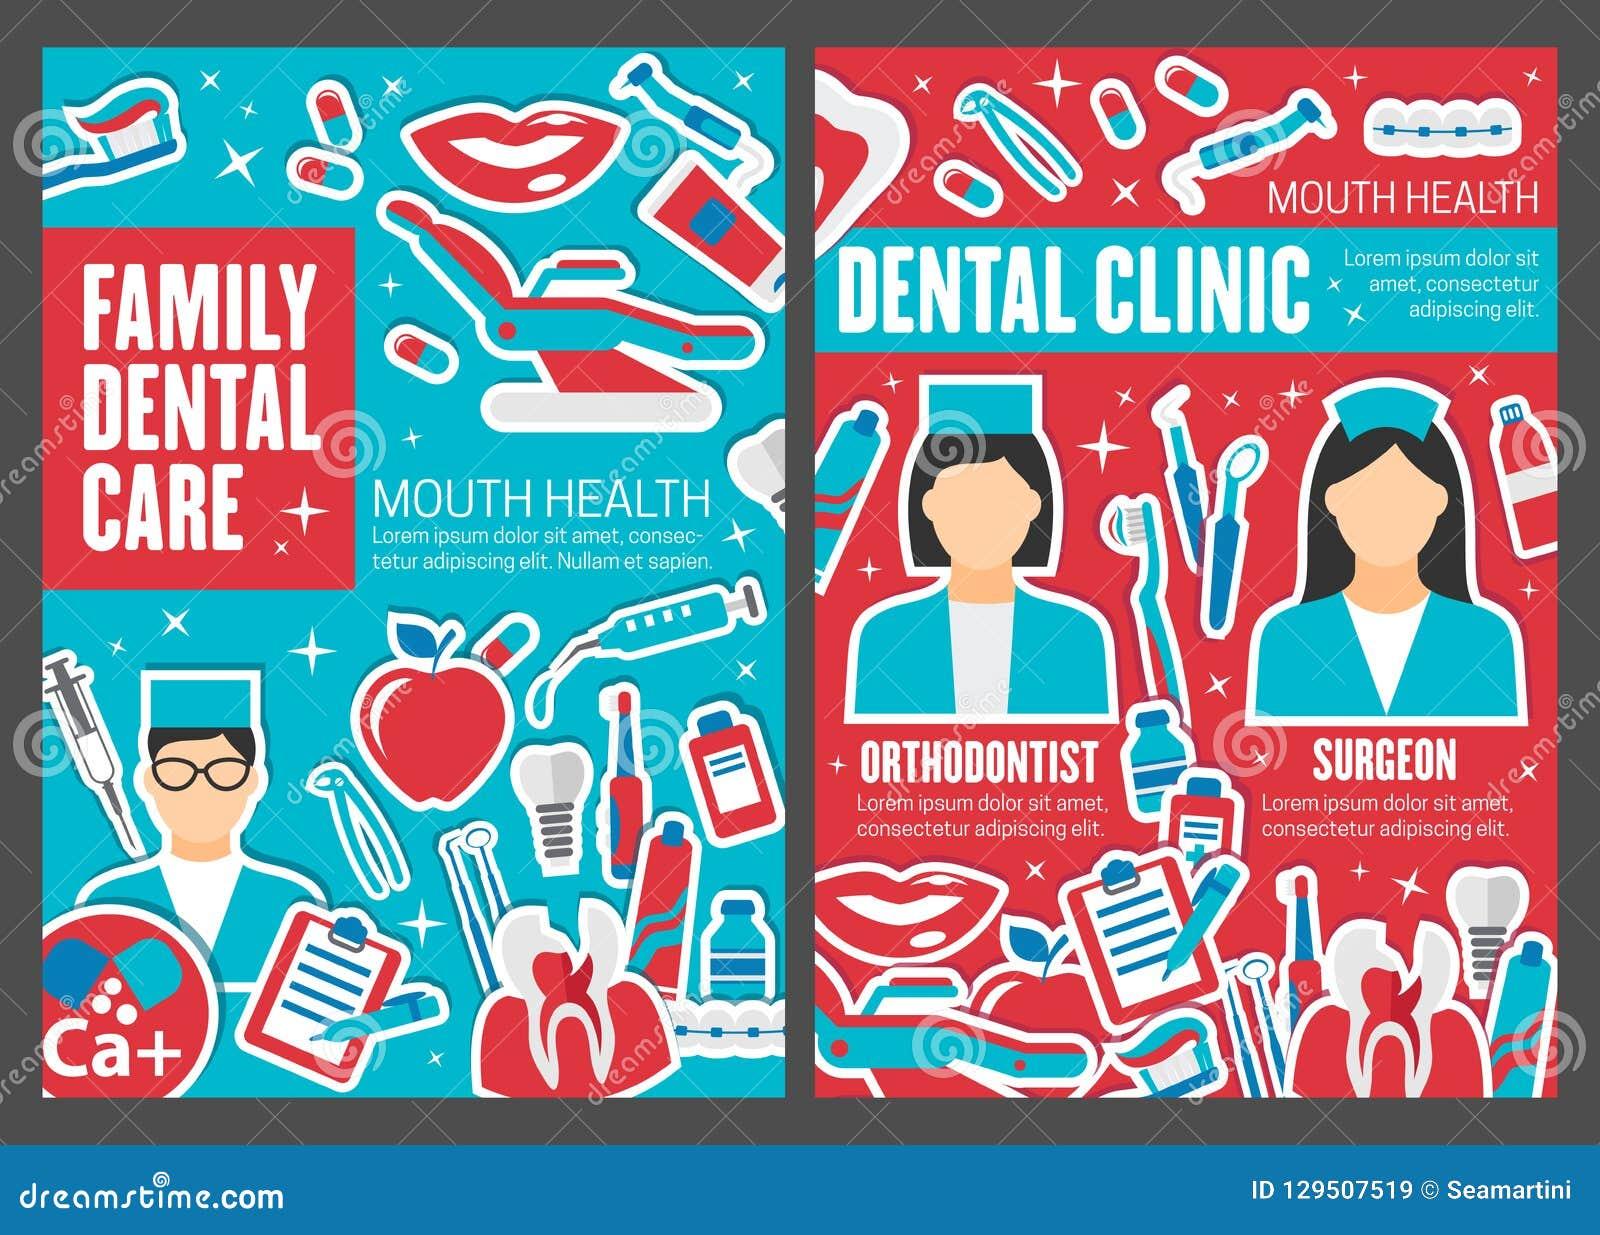 Dental Clinic Doctors, Dentistry Medicine Vector Stock